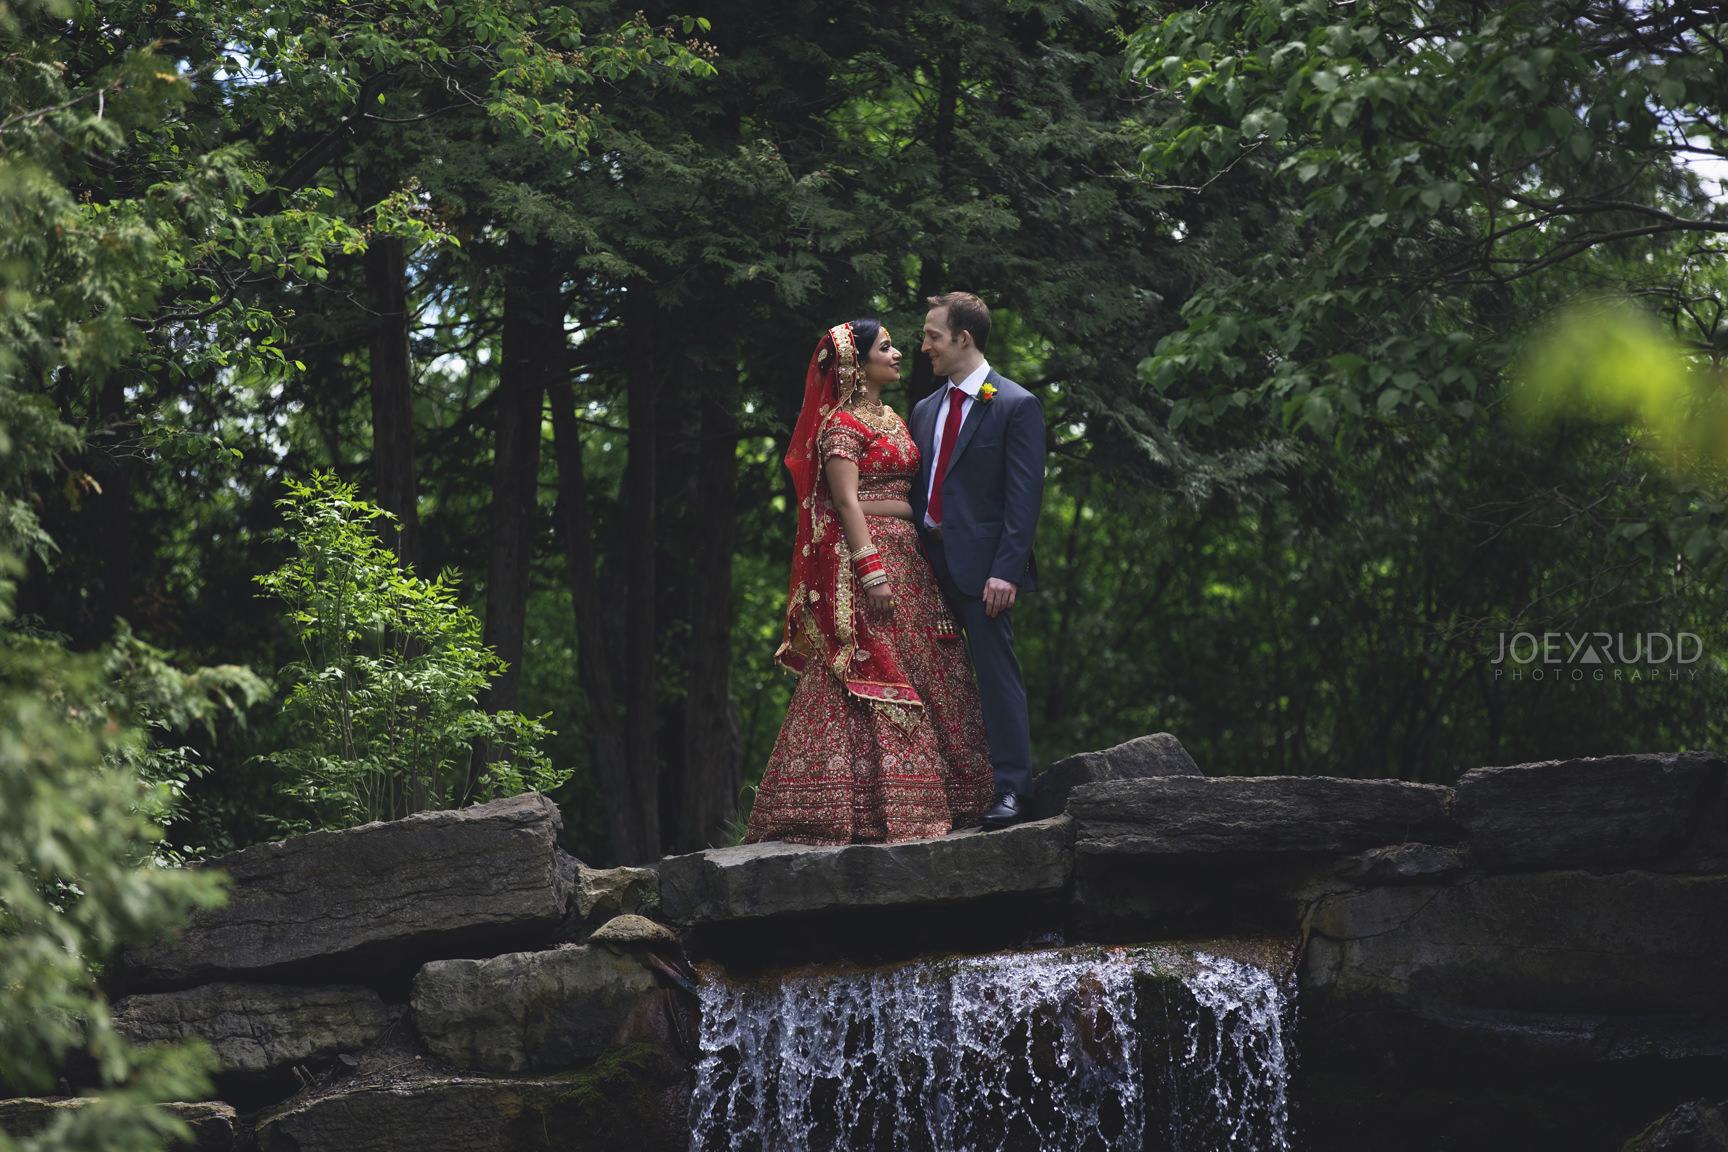 Ottawa Indian Wedding by Ottawa Wedding Photographer Joey Rudd Photography Andrew Haydon Park Waterfall Lifestyle Artistic